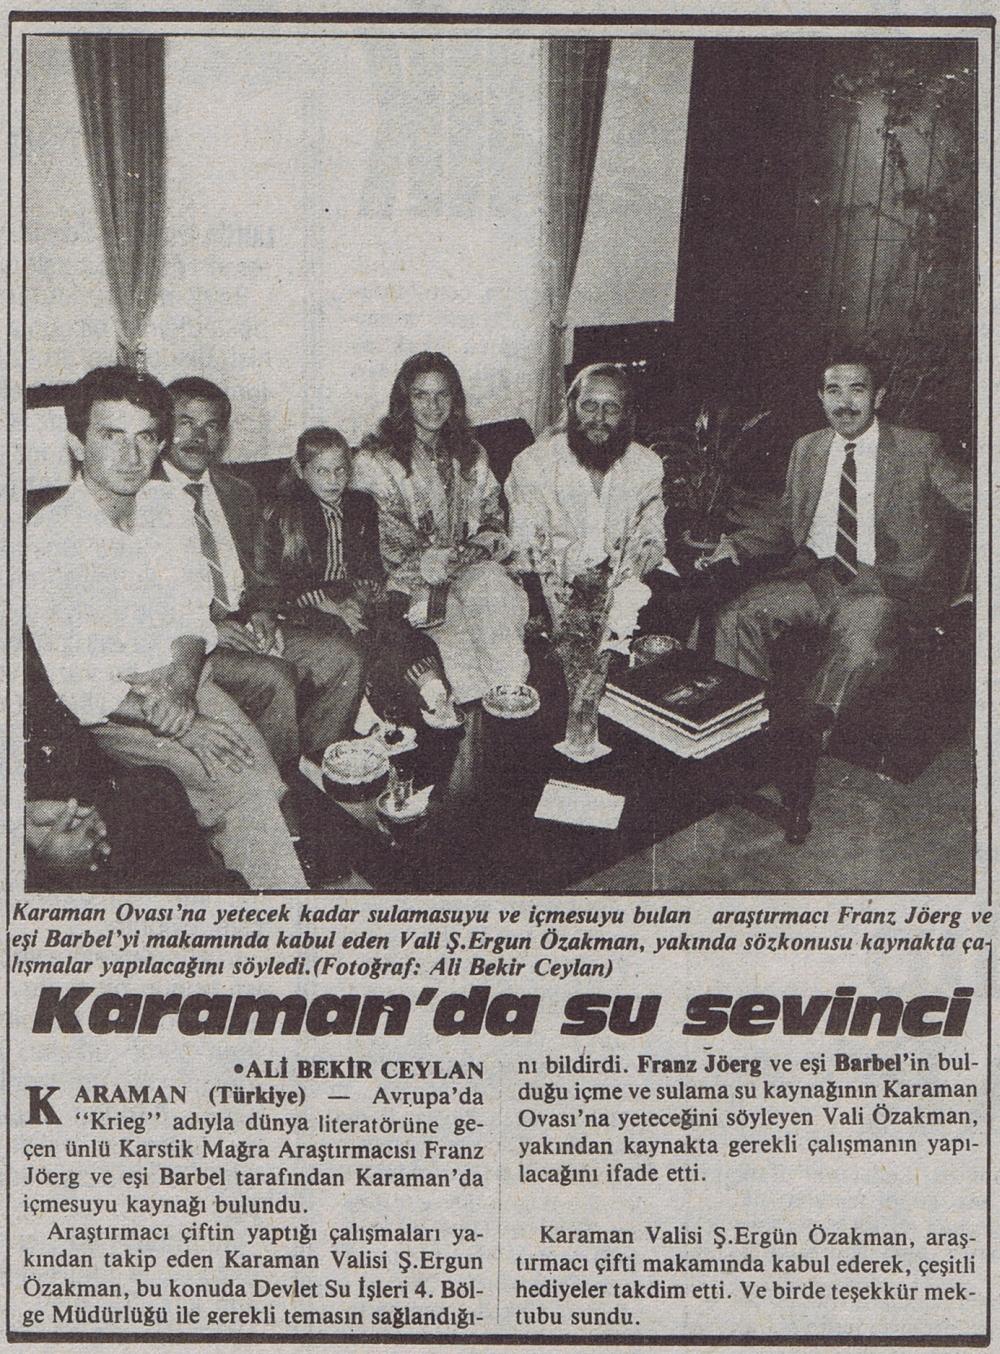 19900813_print_Tuerkiye_Karamanda-su-sevinci_1000